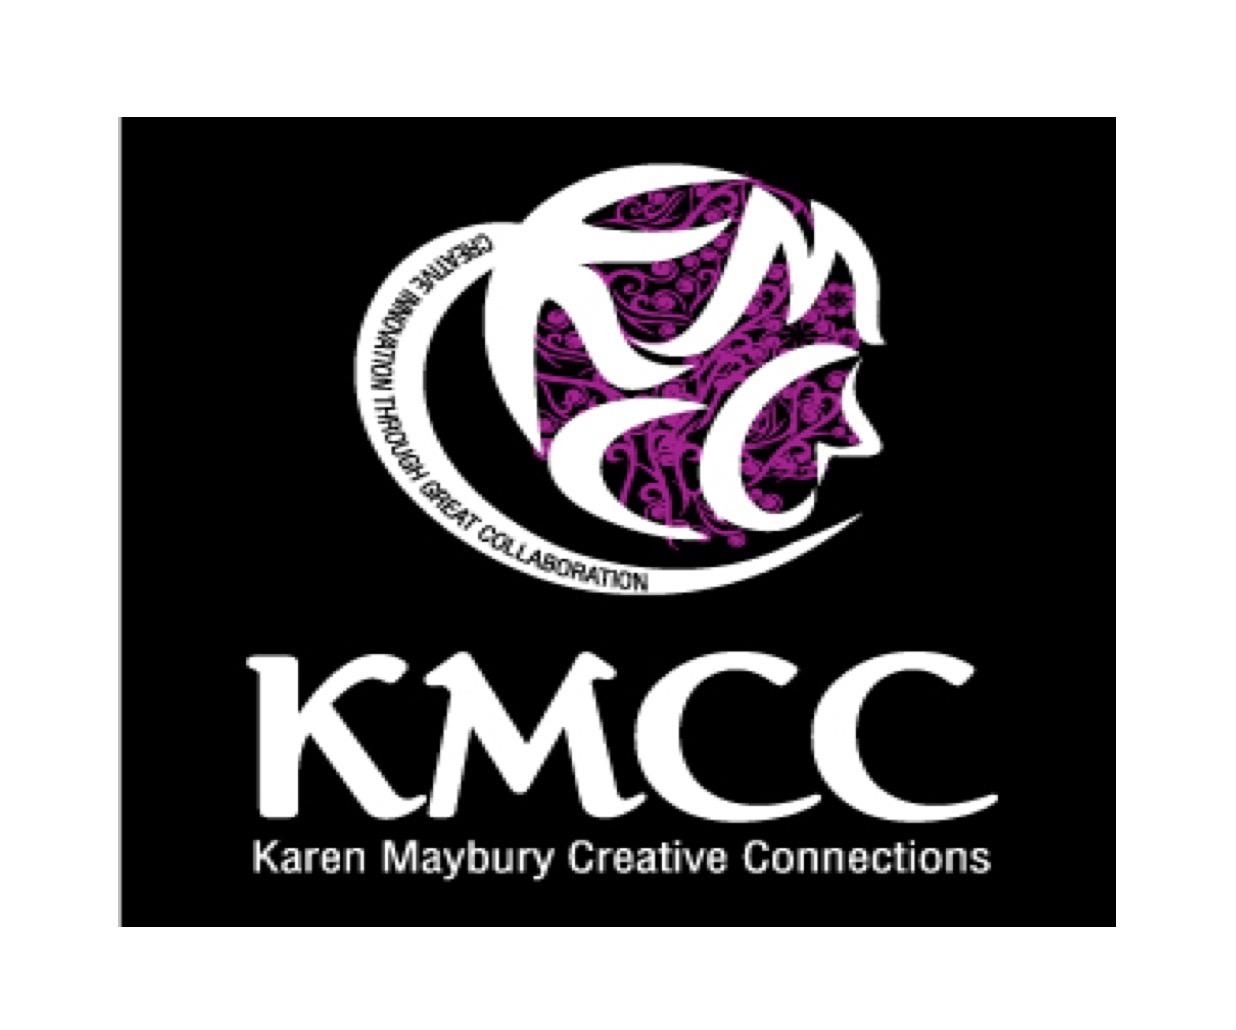 KMCC logo.jpg